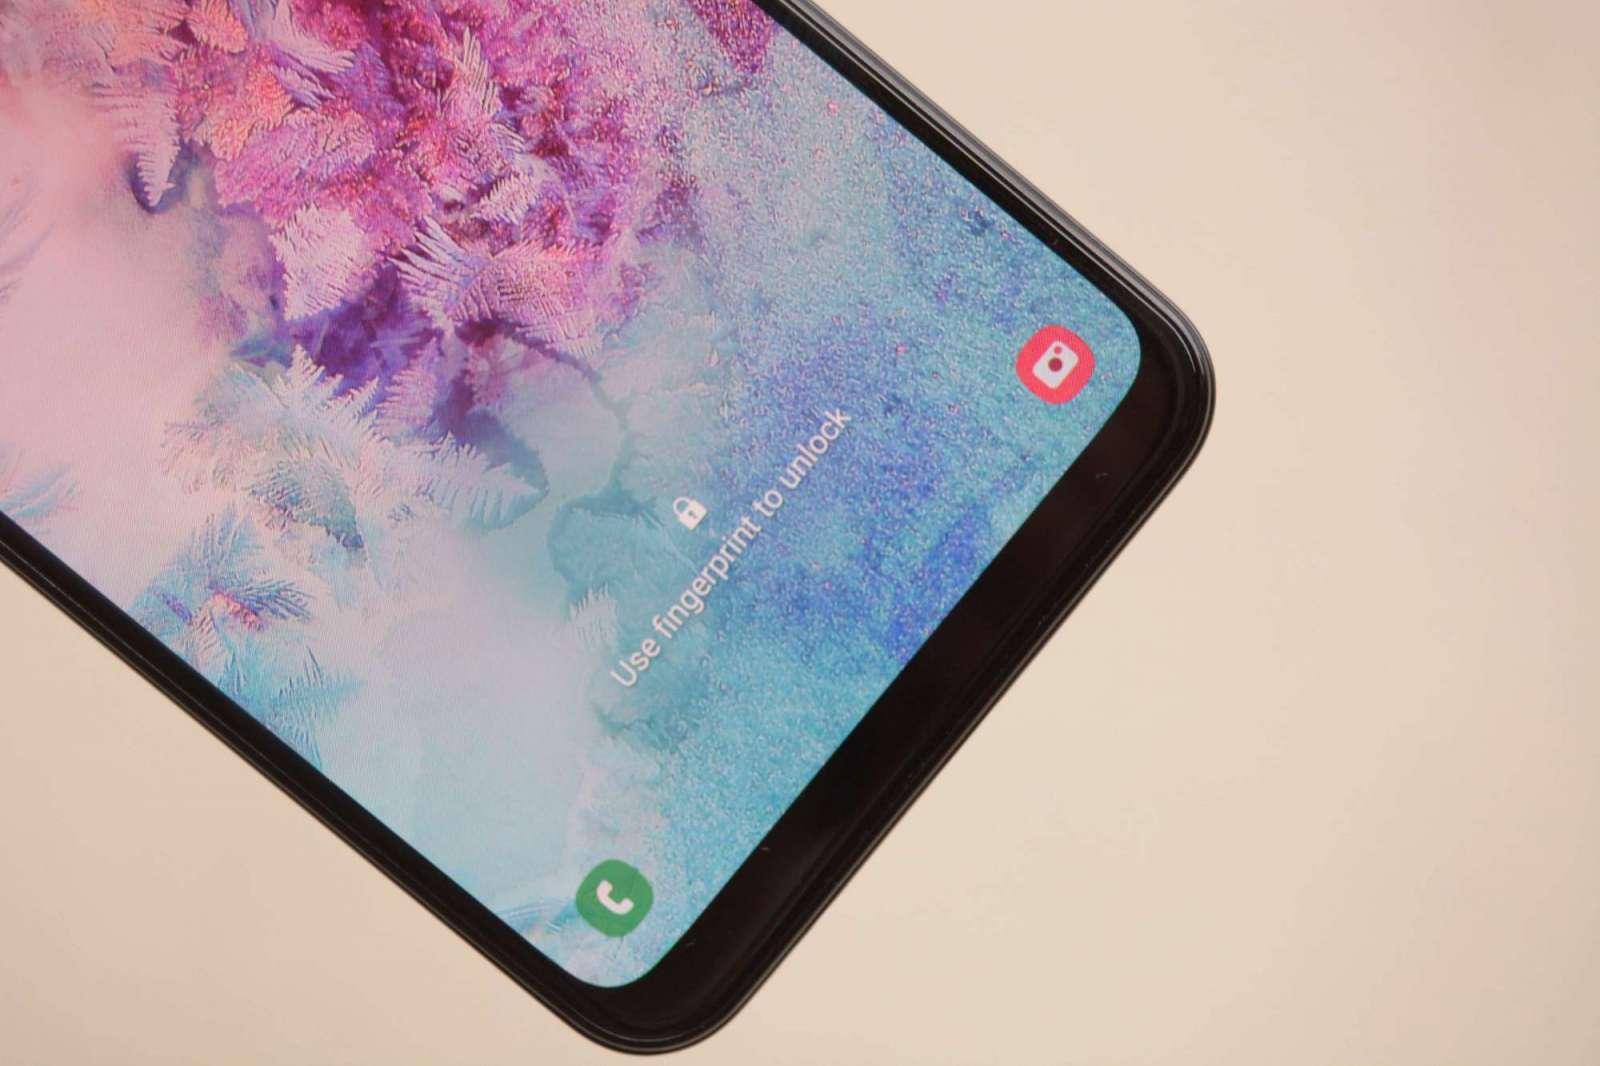 Chin - Samsung Galaxy A20 (Philippines)